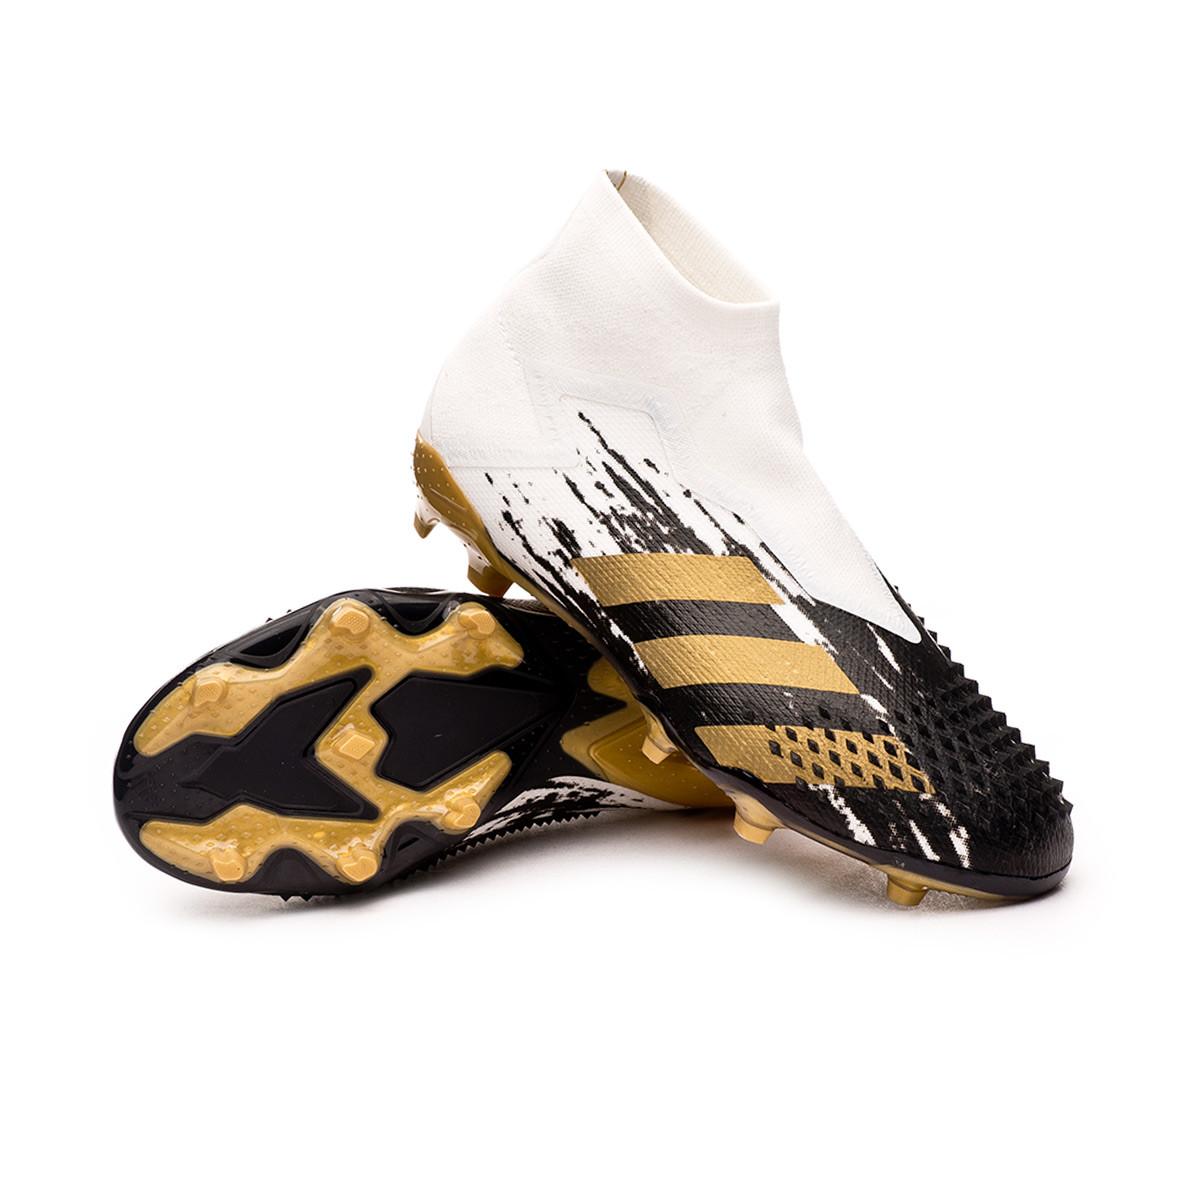 Football Boots adidas Predator Mutator